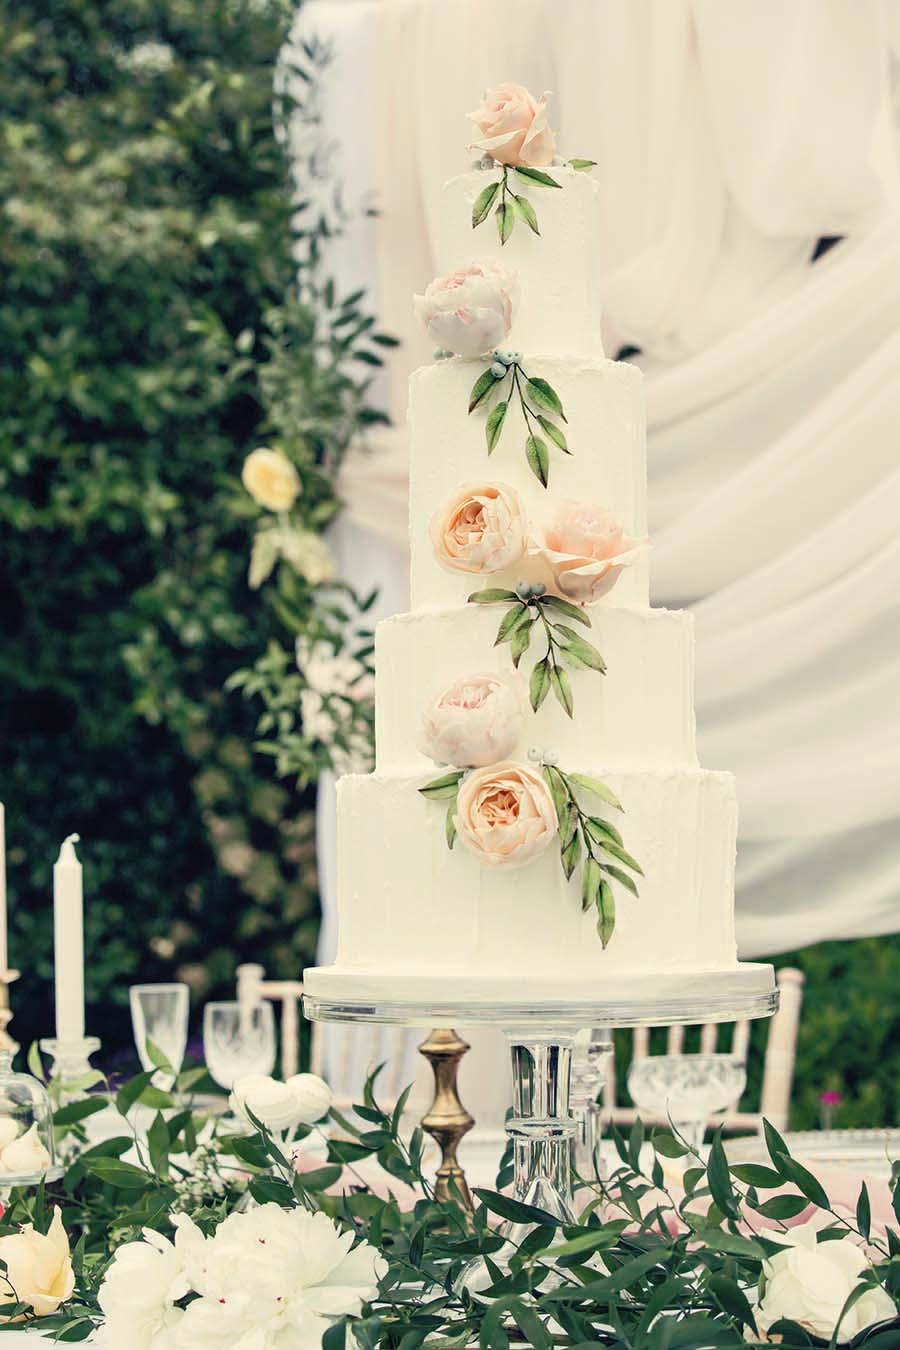 Buckinghams Wedding Magazine – Hodsock Photoshoot 2018 – Dottie Photography (81)